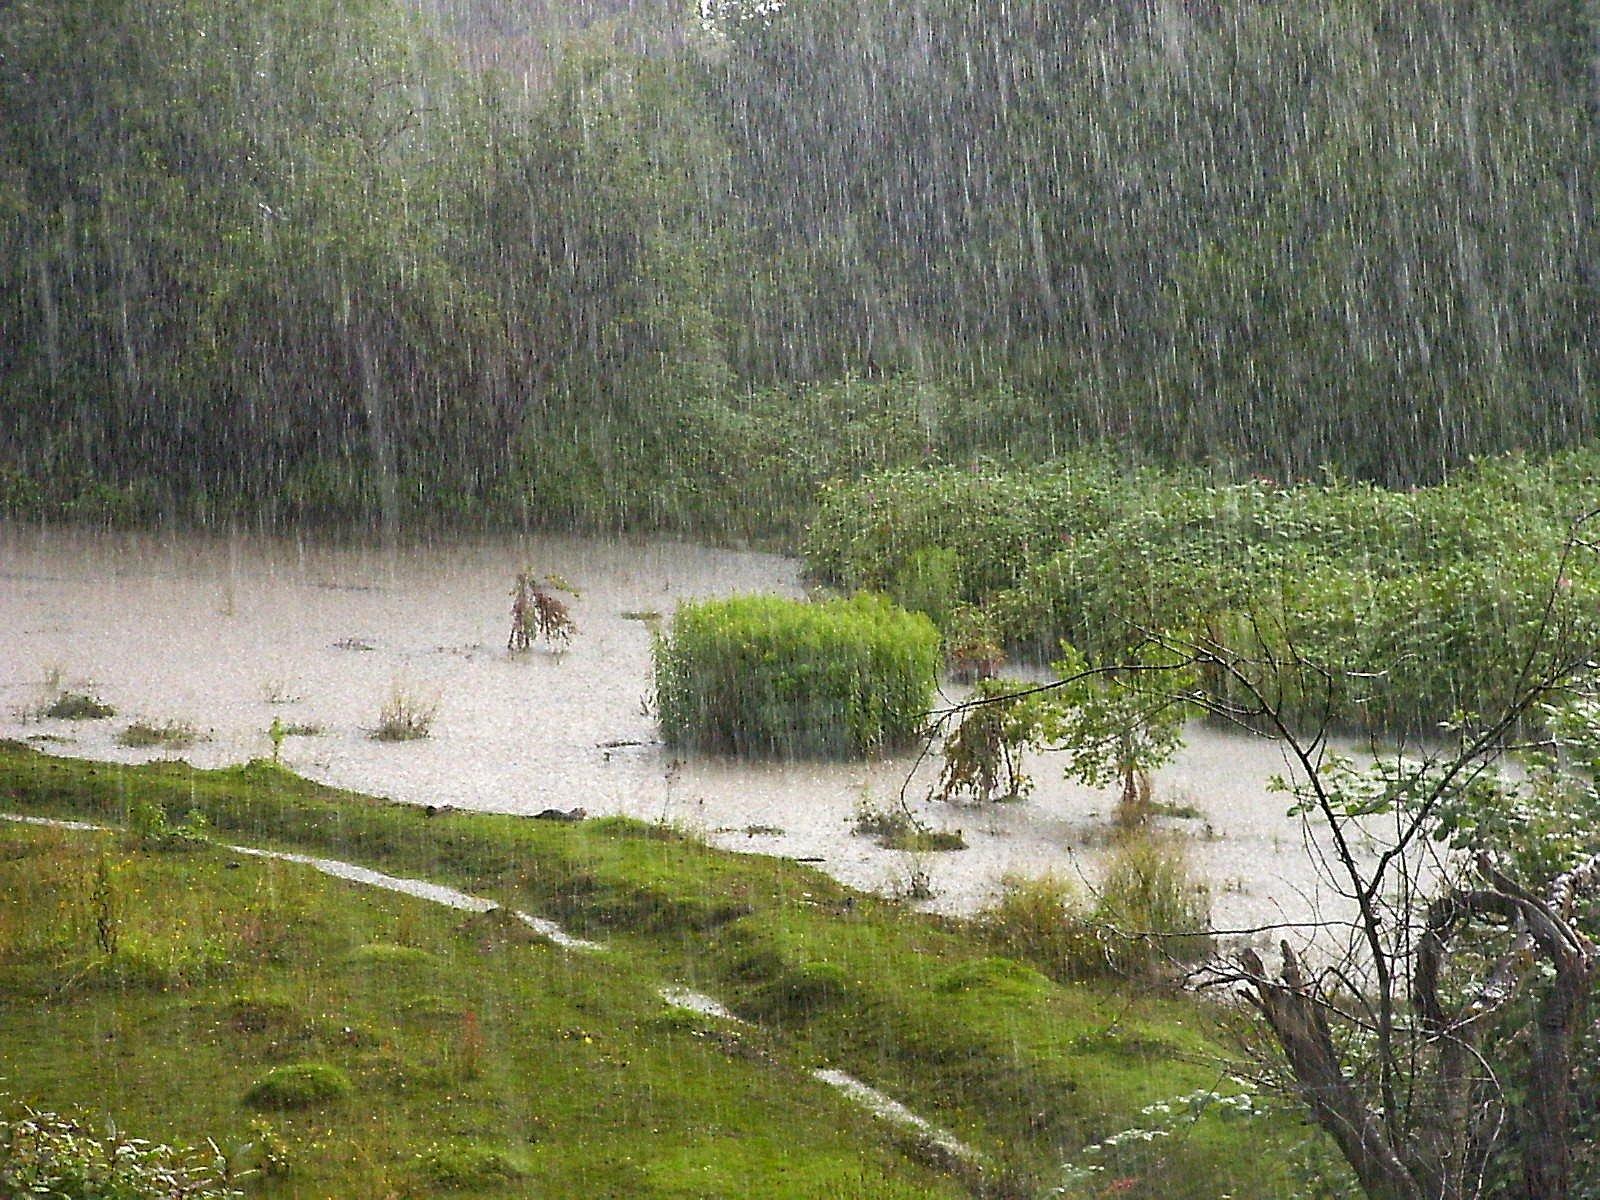 A cleansing rain falls; a soil-filled mist arises